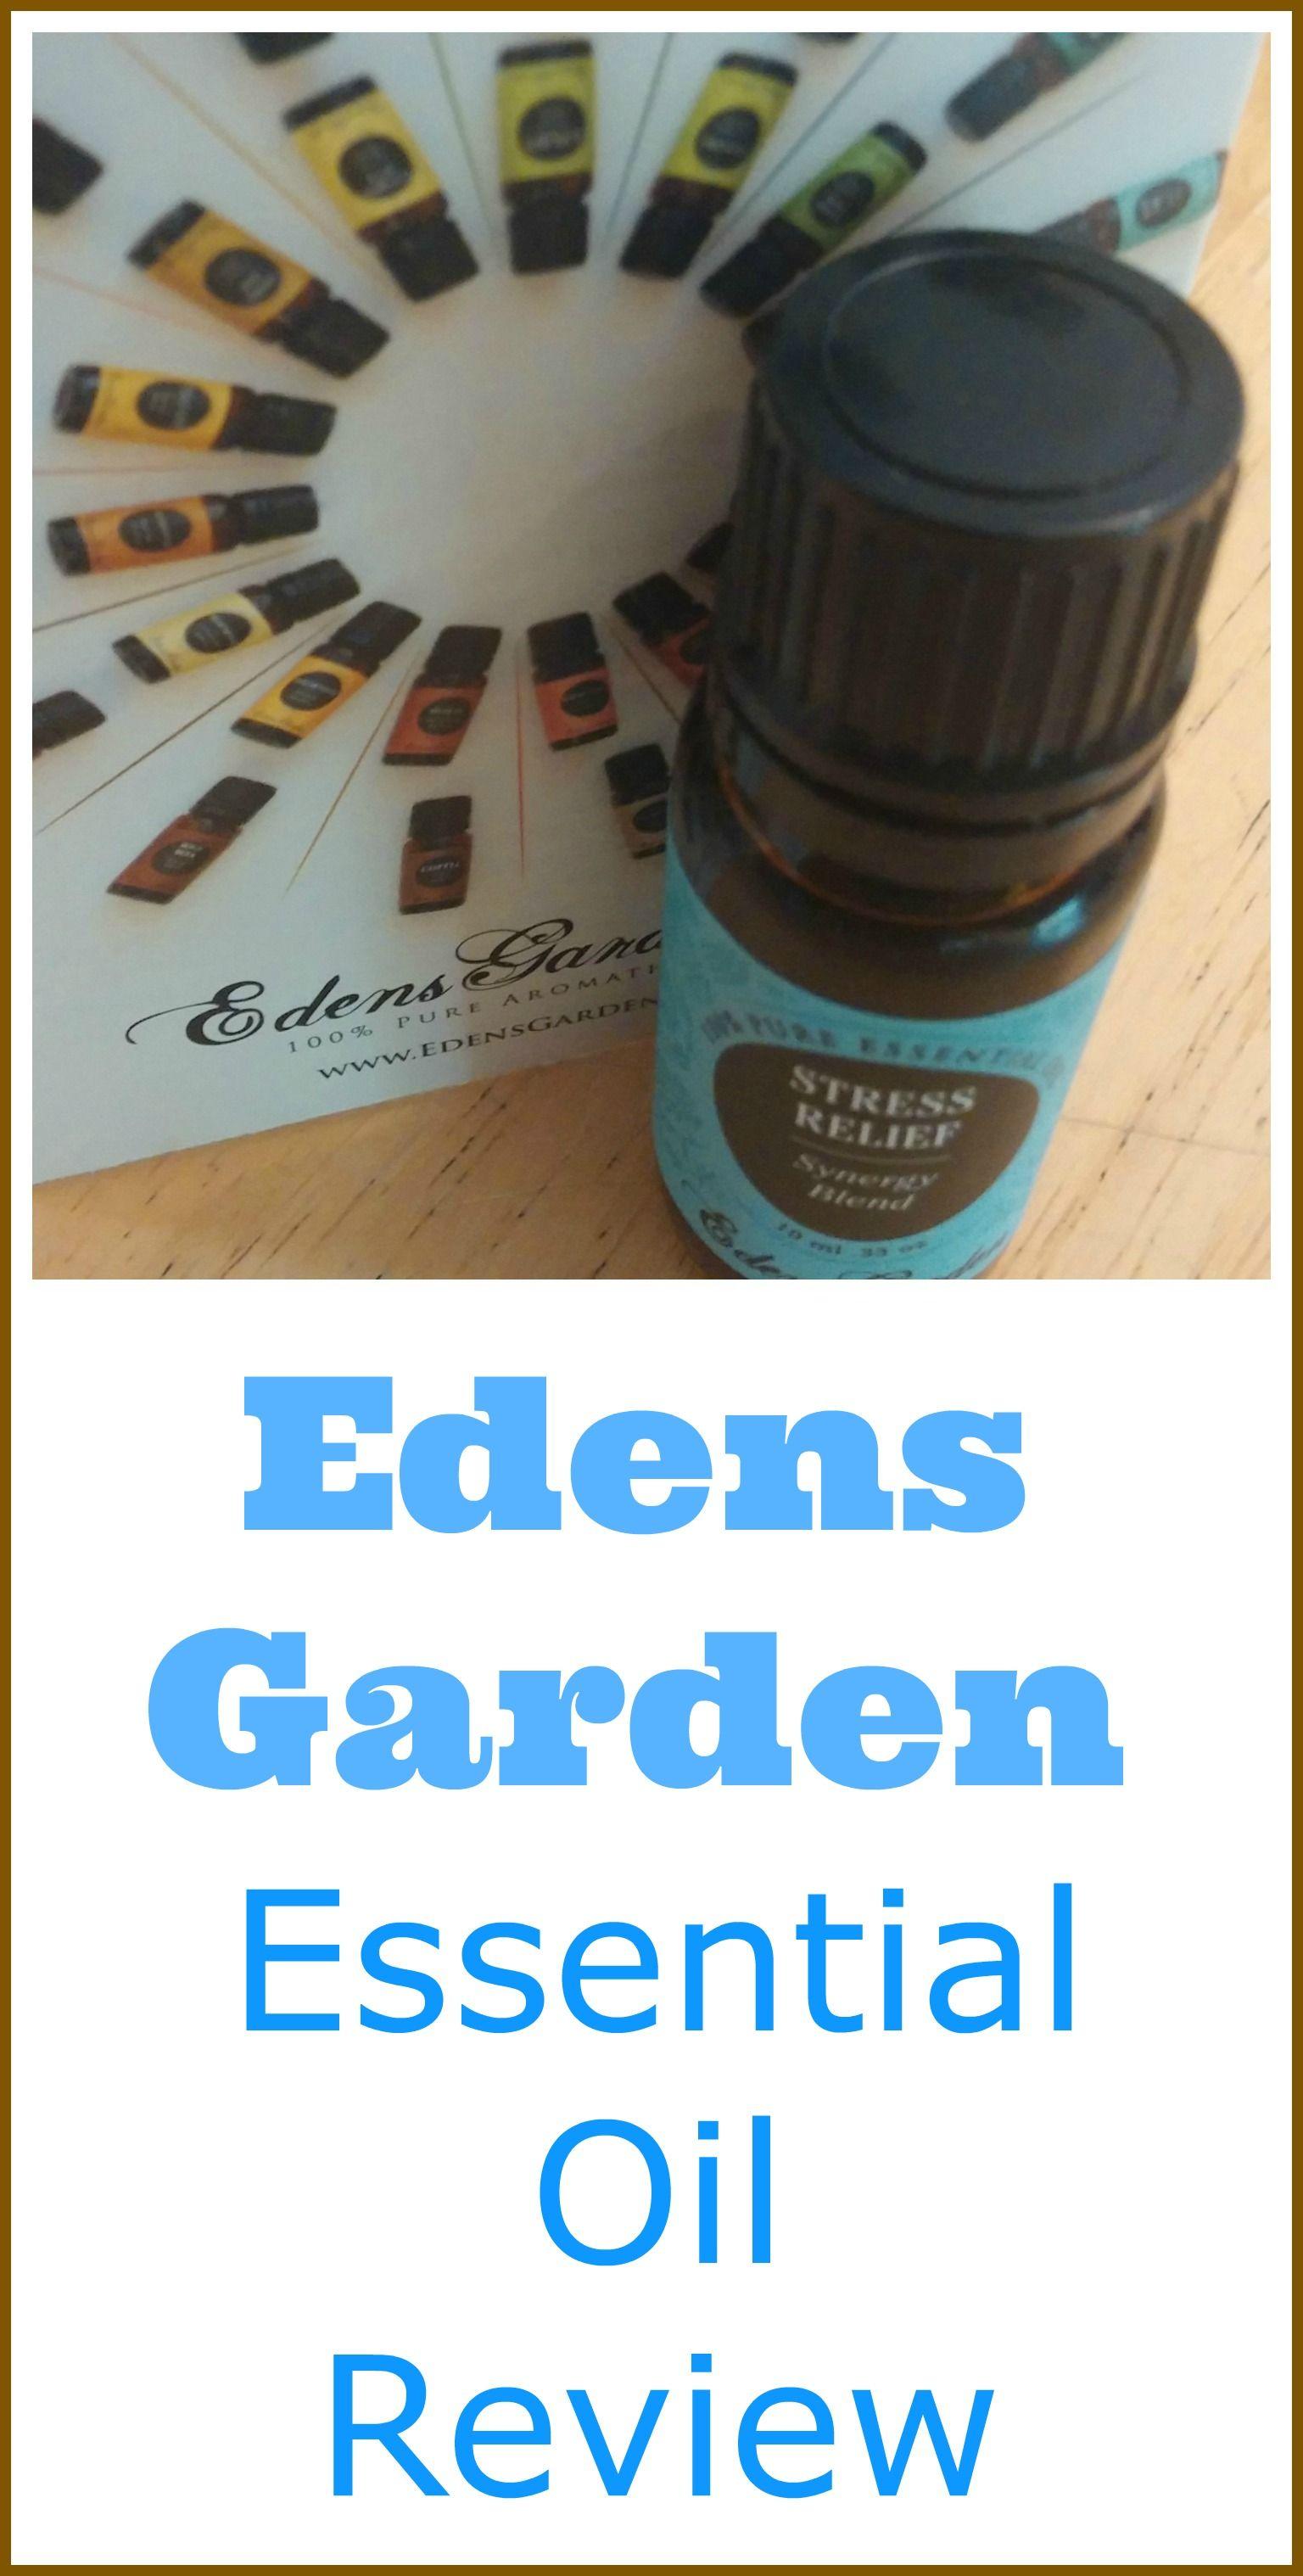 Edens garden essential oils reviews healing with - Are edens garden essential oils ingestible ...